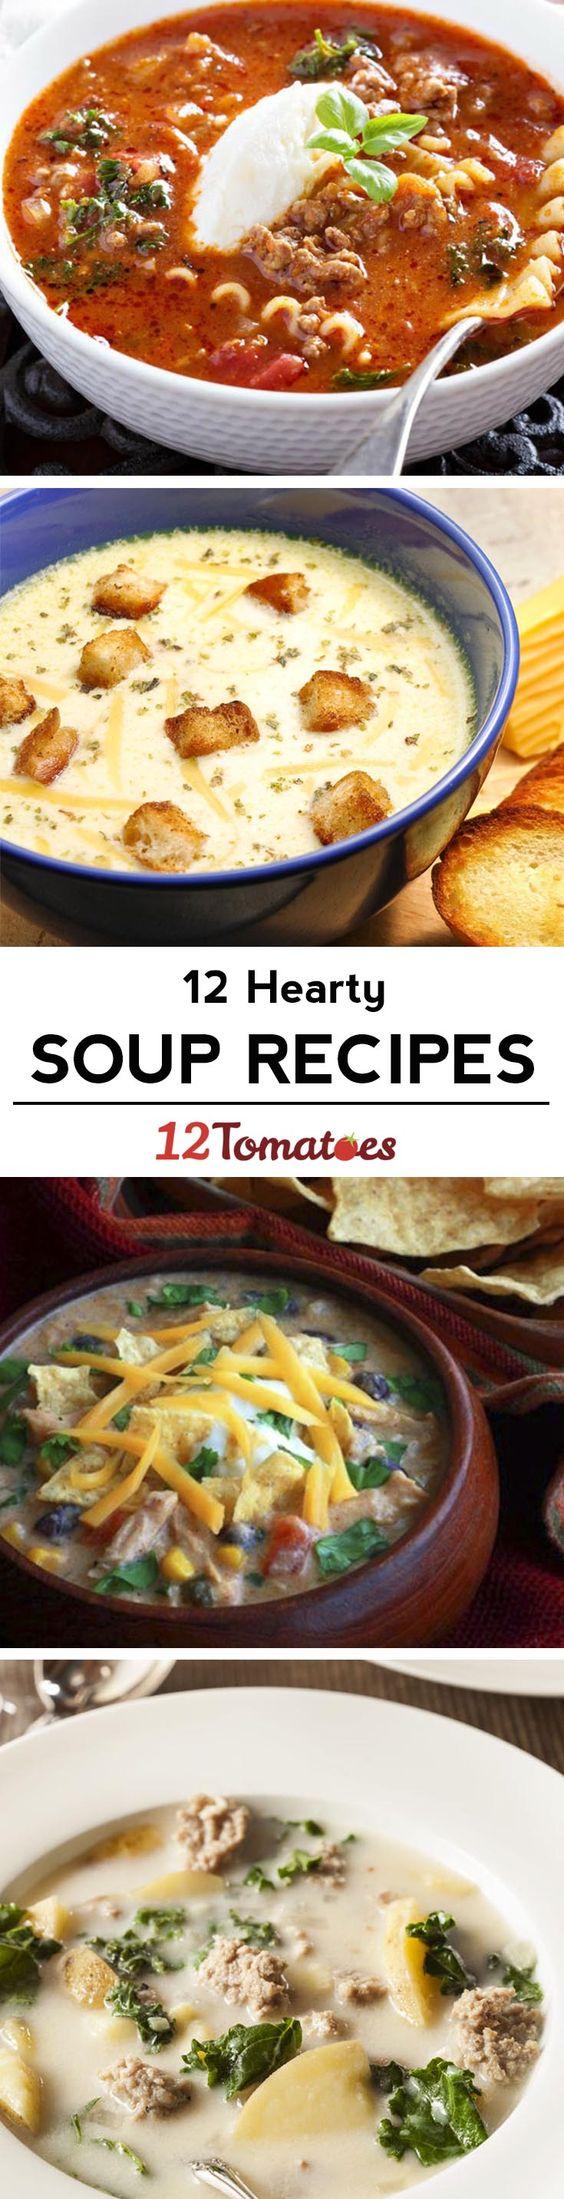 12 soup recipes to get you through the winter!